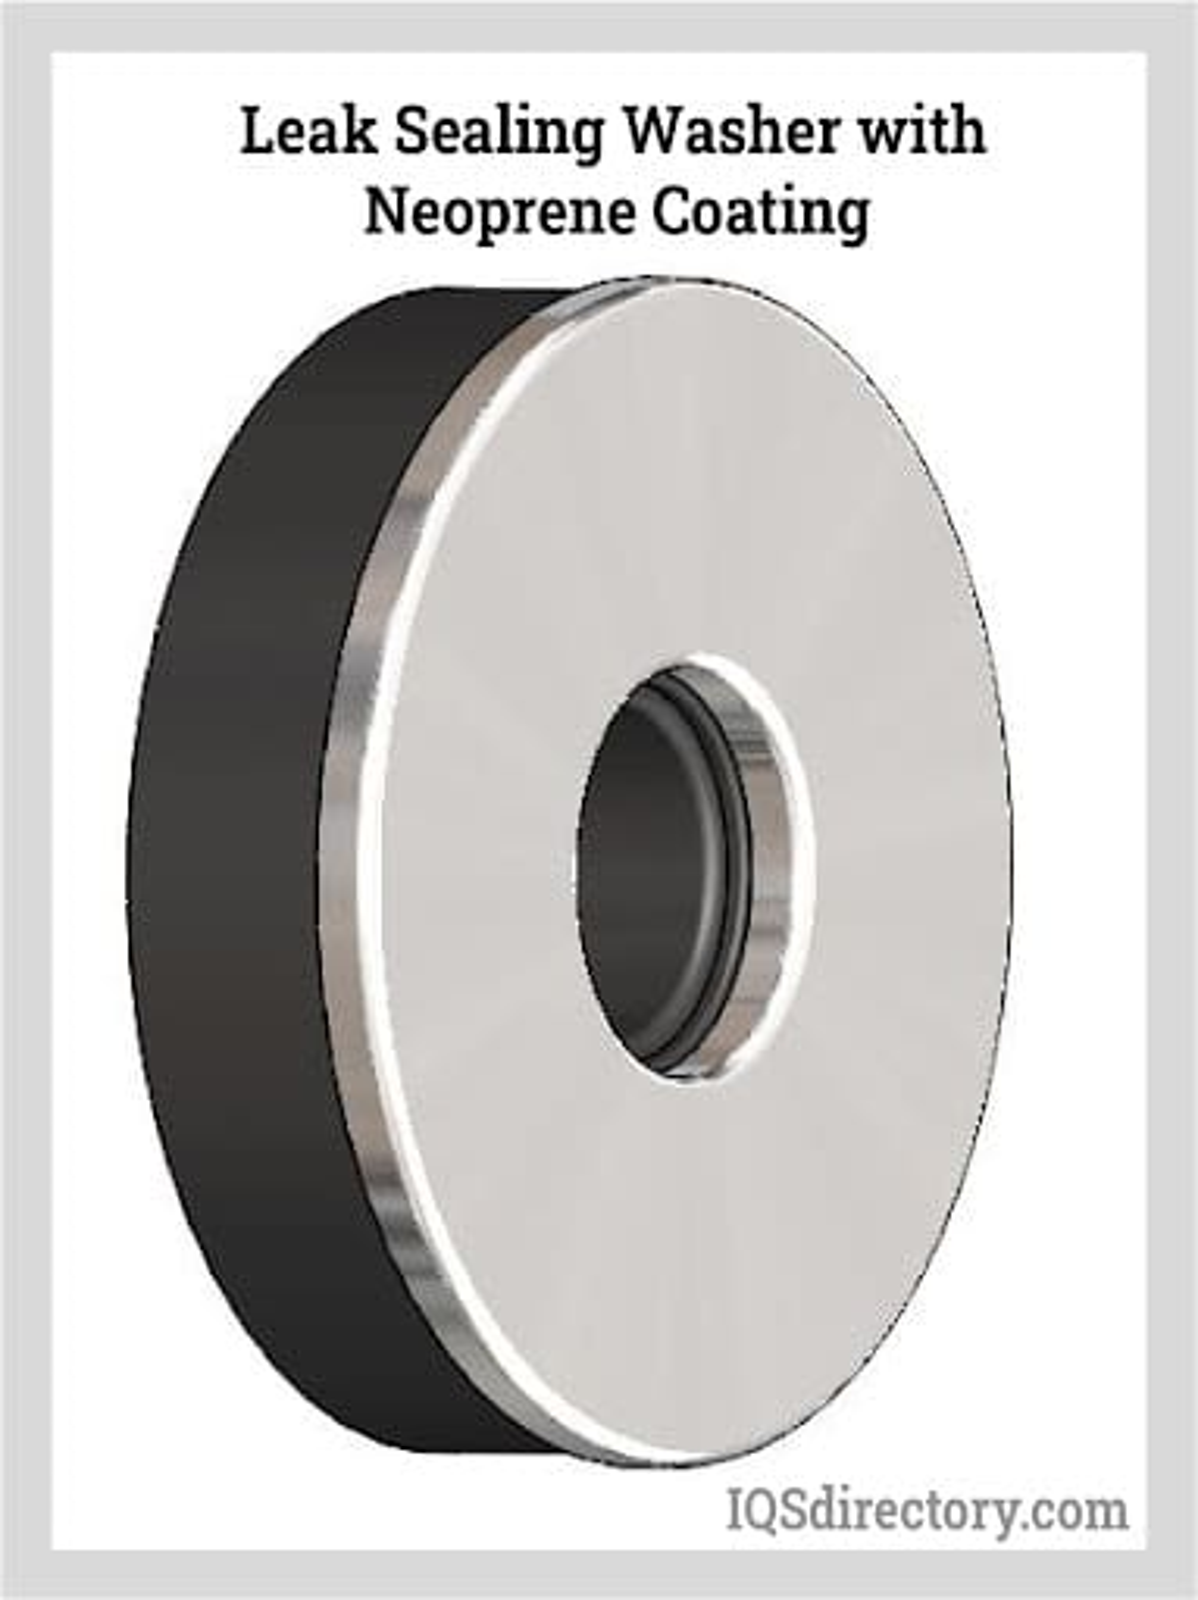 Leak Sealing Washer with Neoprene Coating